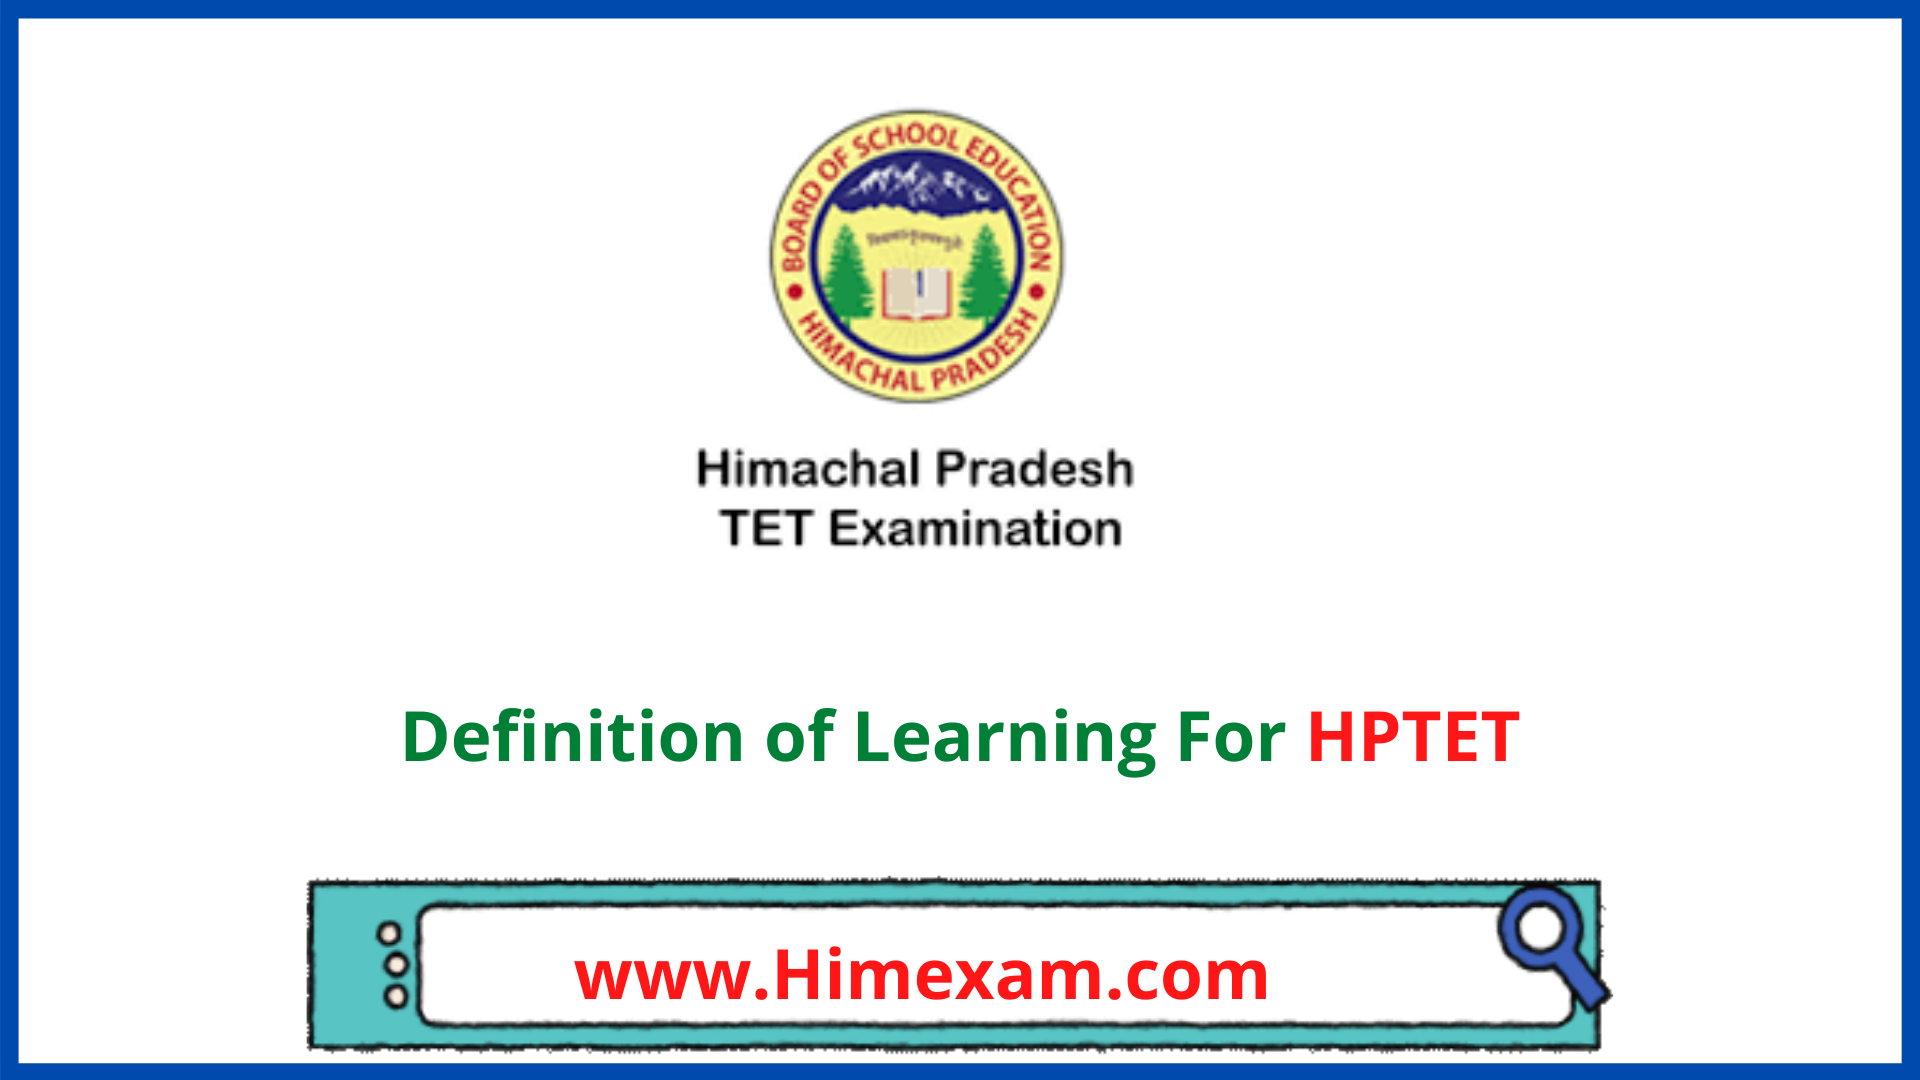 Definition of Learning For HPTET